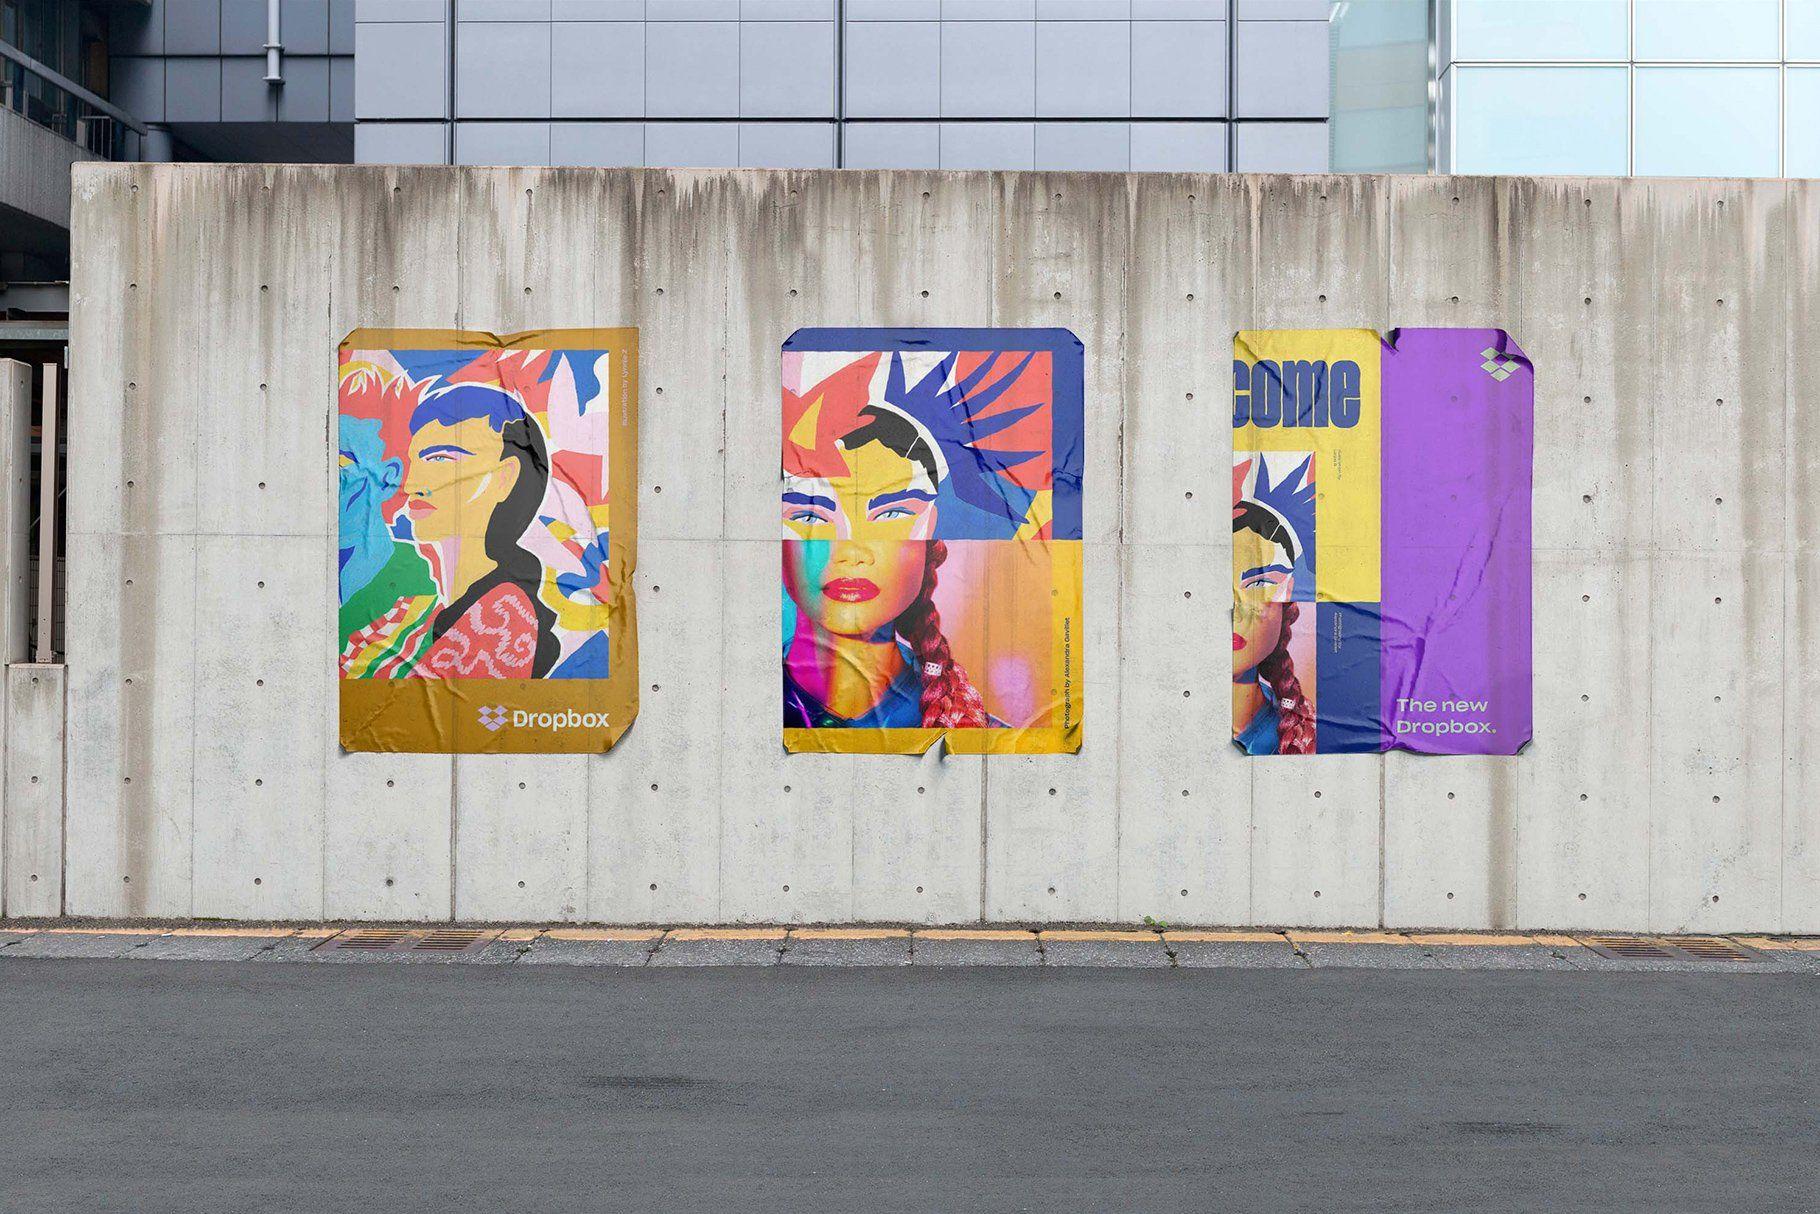 12 Urban Street Mockups Psd Mockup Psd Branding Mockups Illustration Design